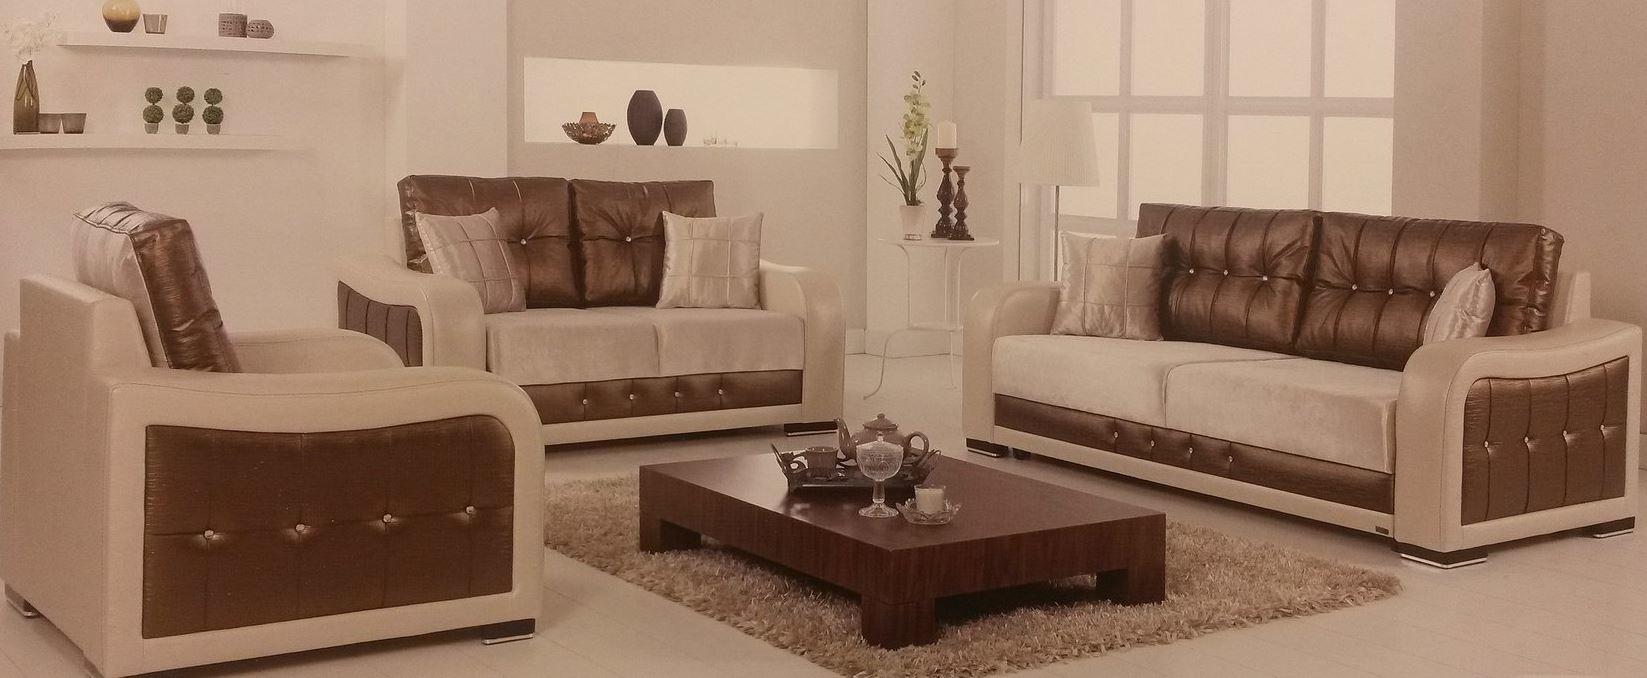 Jr Furniture Lexington Ky 40503 Pennysaverusa Watermelon Wallpaper Rainbow Find Free HD for Desktop [freshlhys.tk]